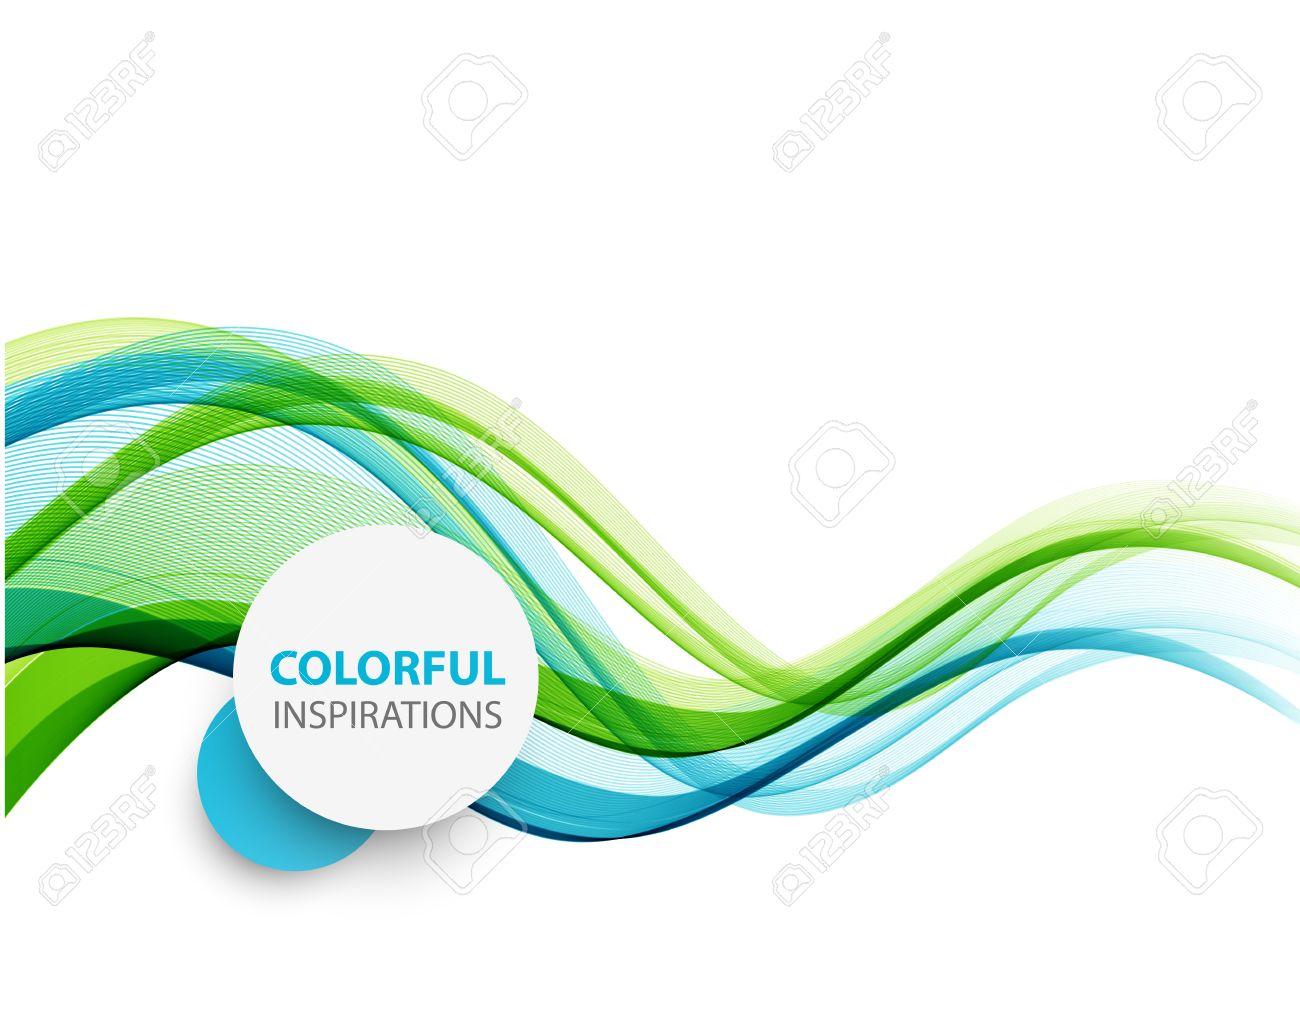 Abstract vector background, blue and green waved lines for brochure, website, flyer design. illustration eps10 - 51754453